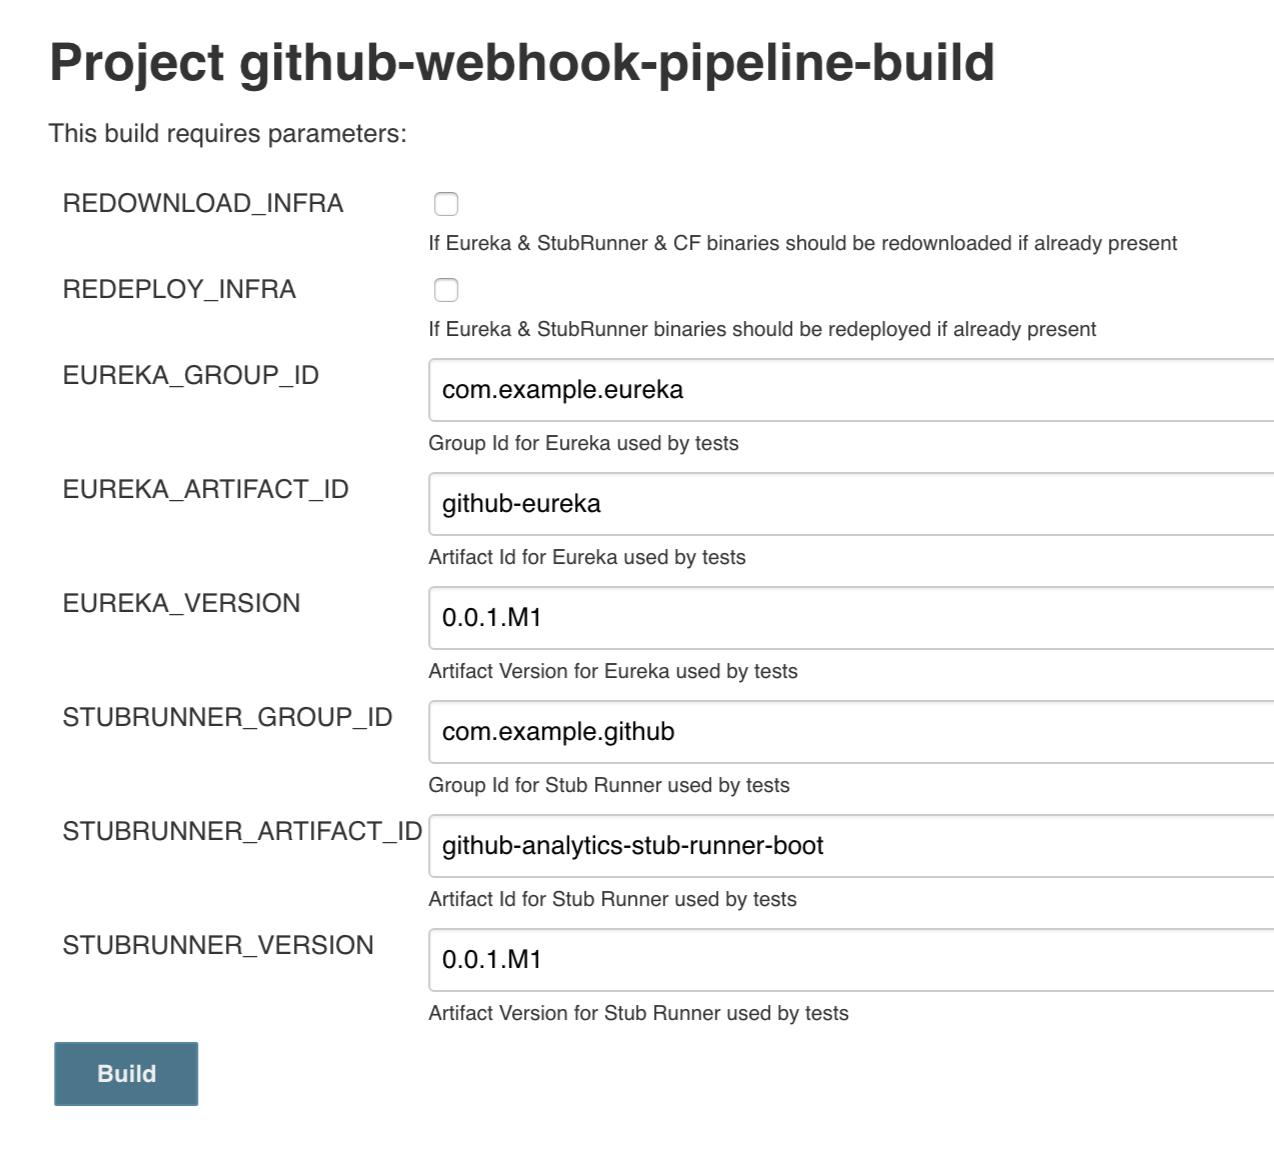 GitHub - marcingrzejszczak/jenkins-pipeline: DEPRECATED